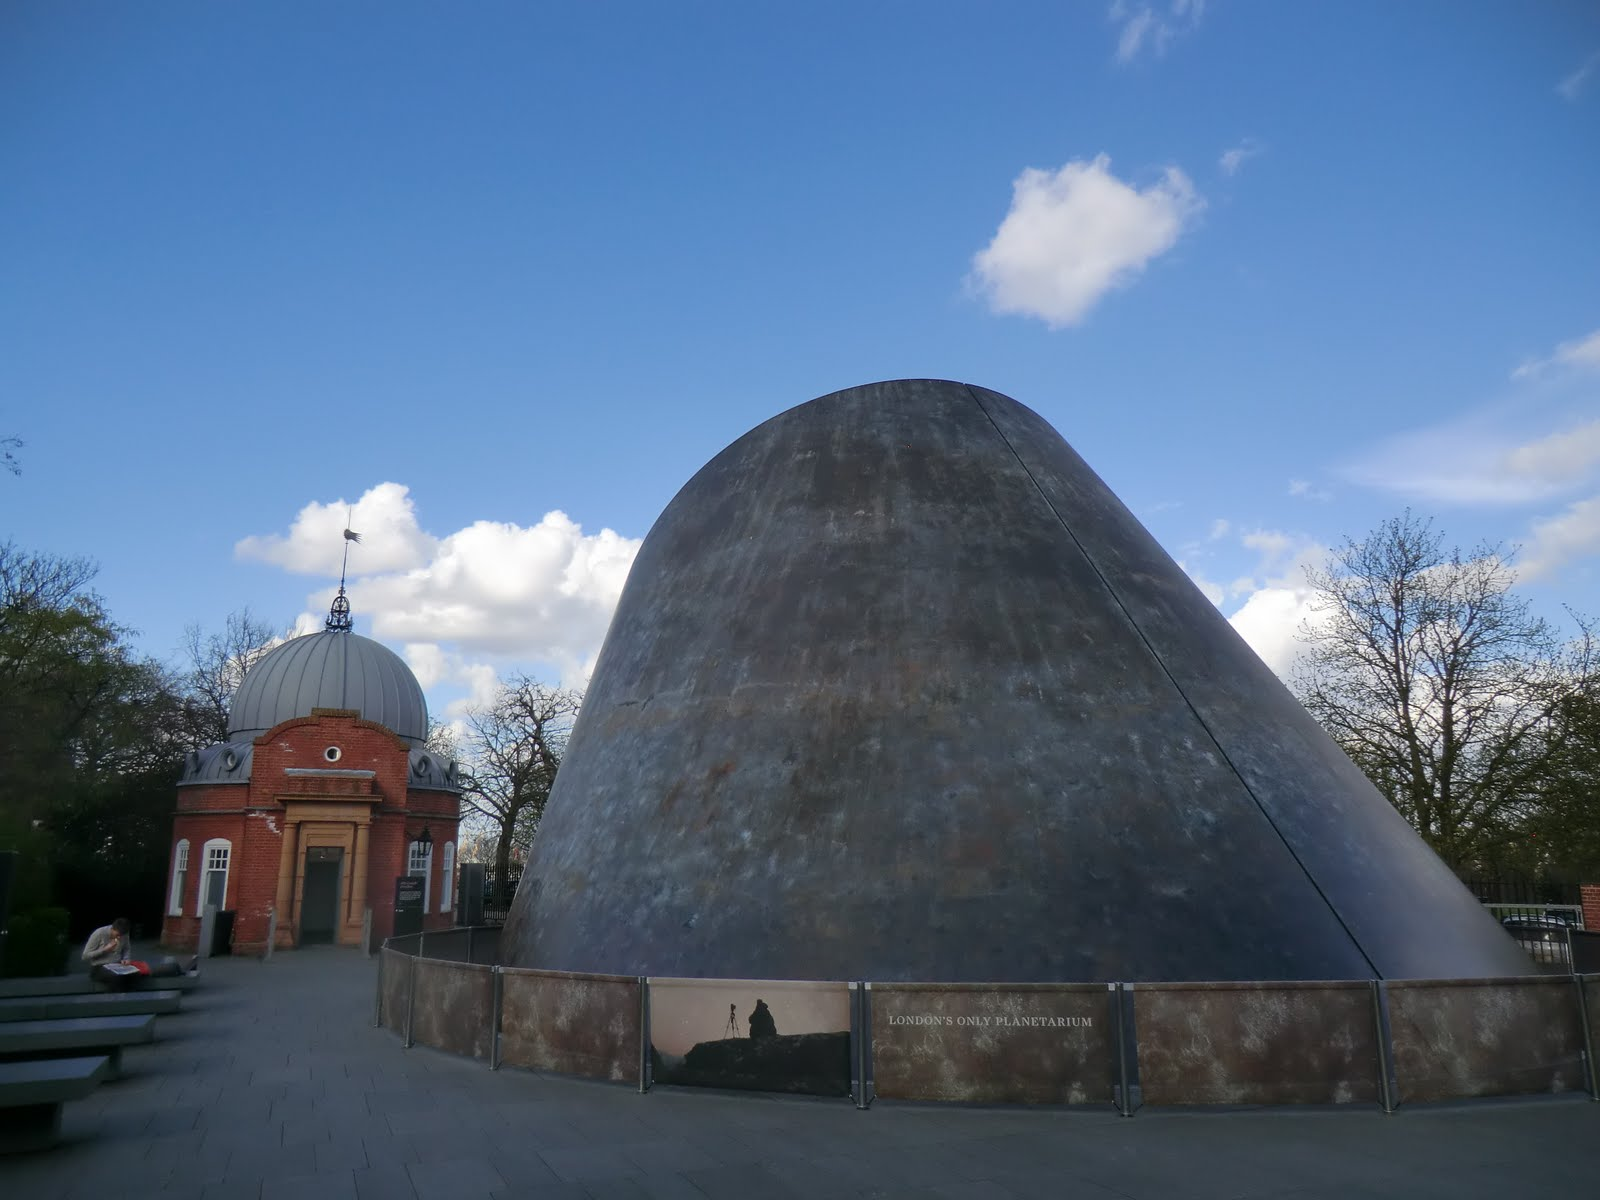 CIMG0223 Planetarium, Old Royal Observatory